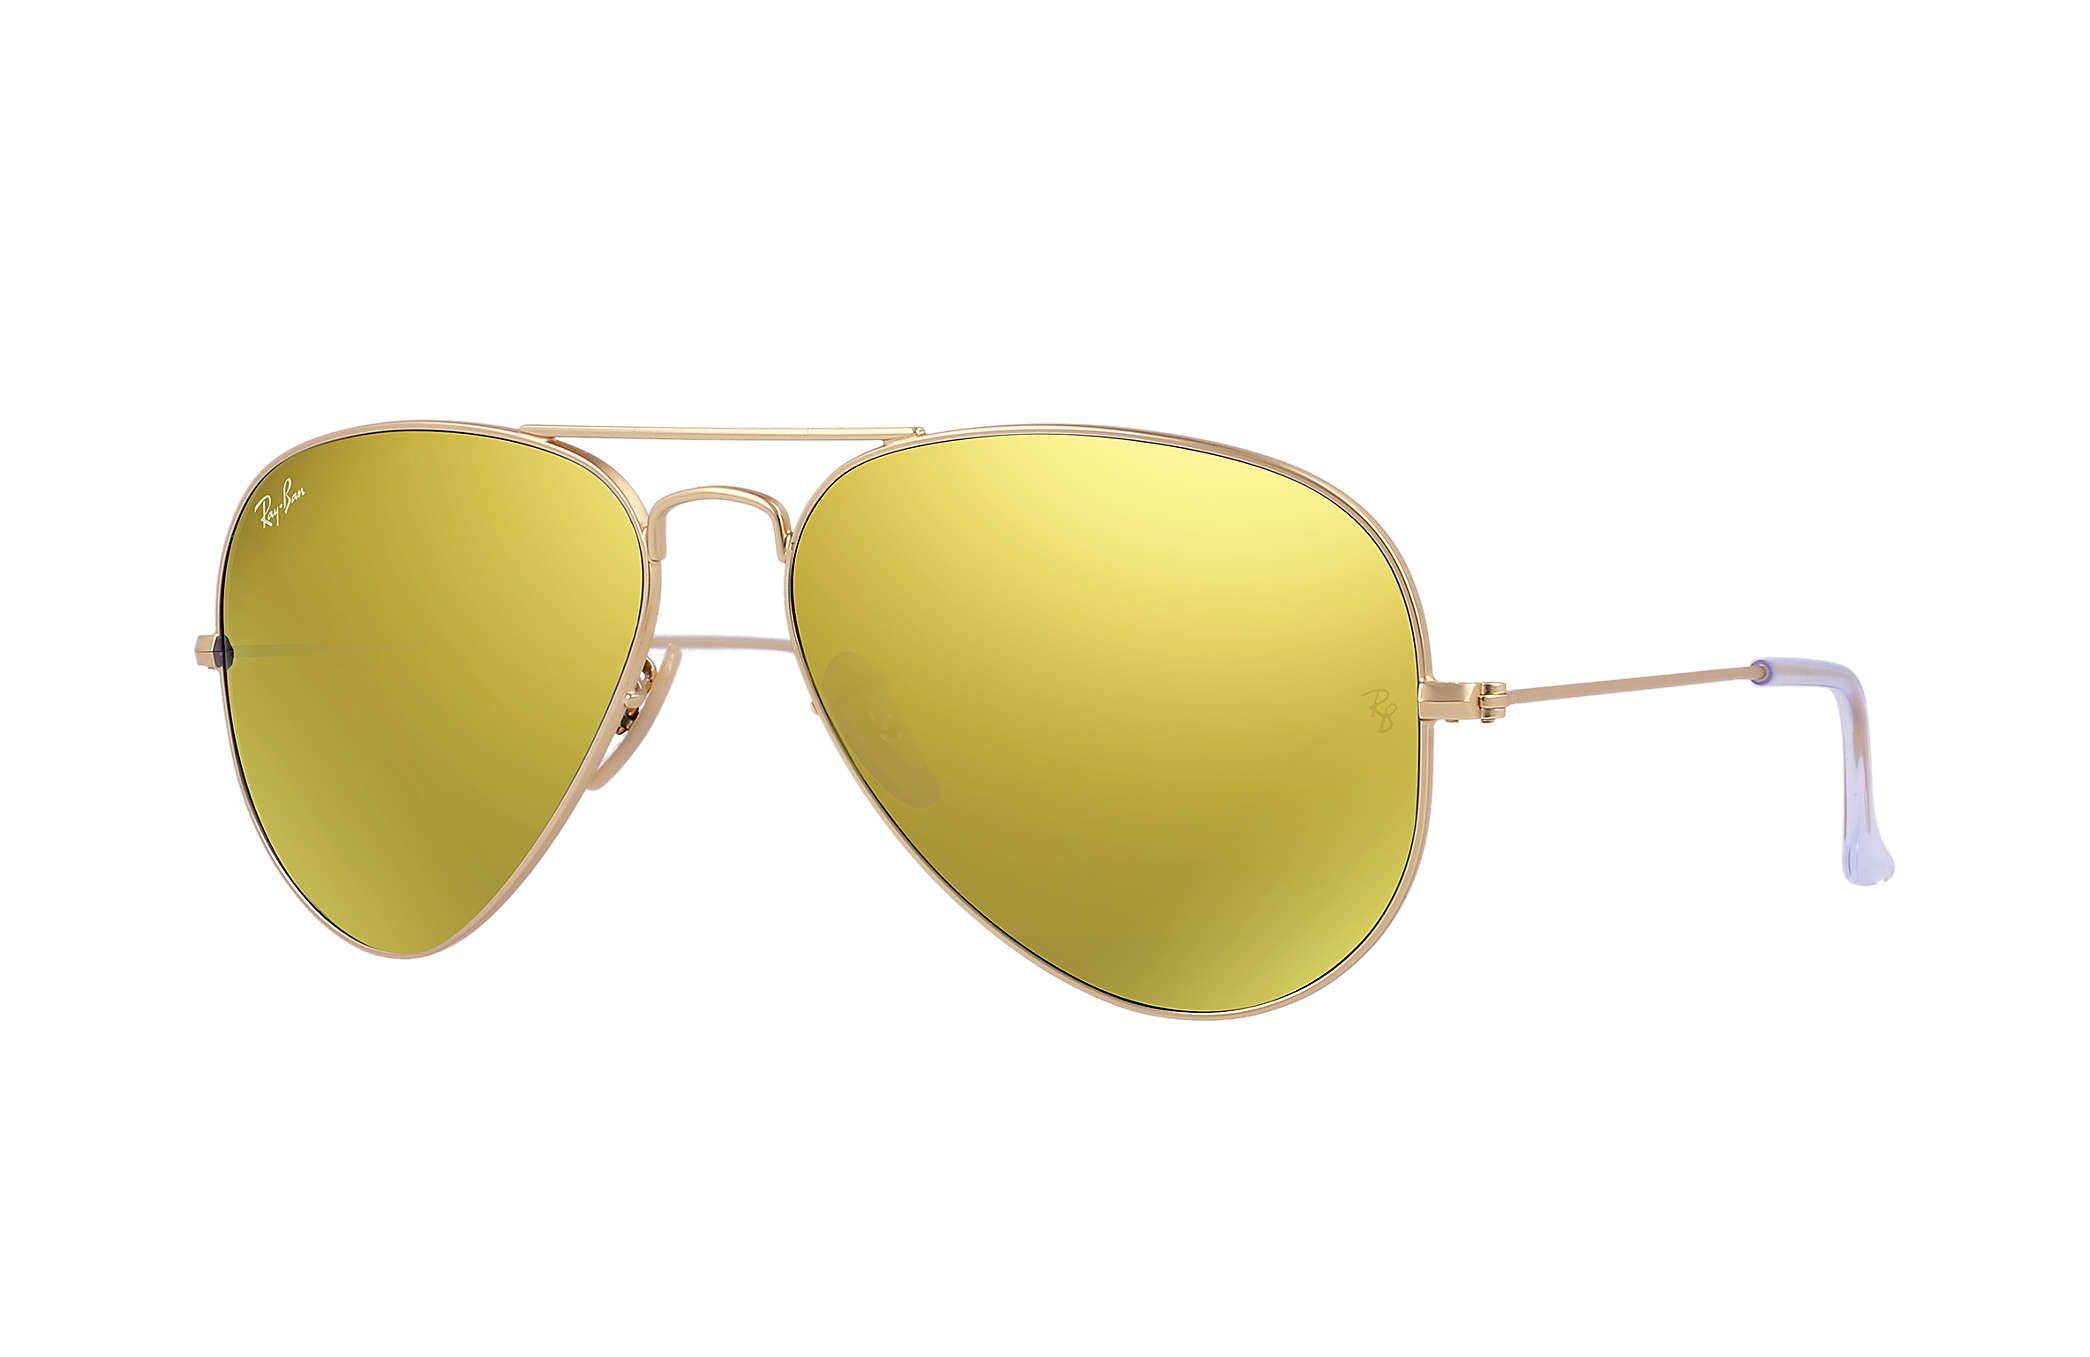 5fa2a9196b Ray-Ban แว่นตา รุ่น AVIATOR FLASH L